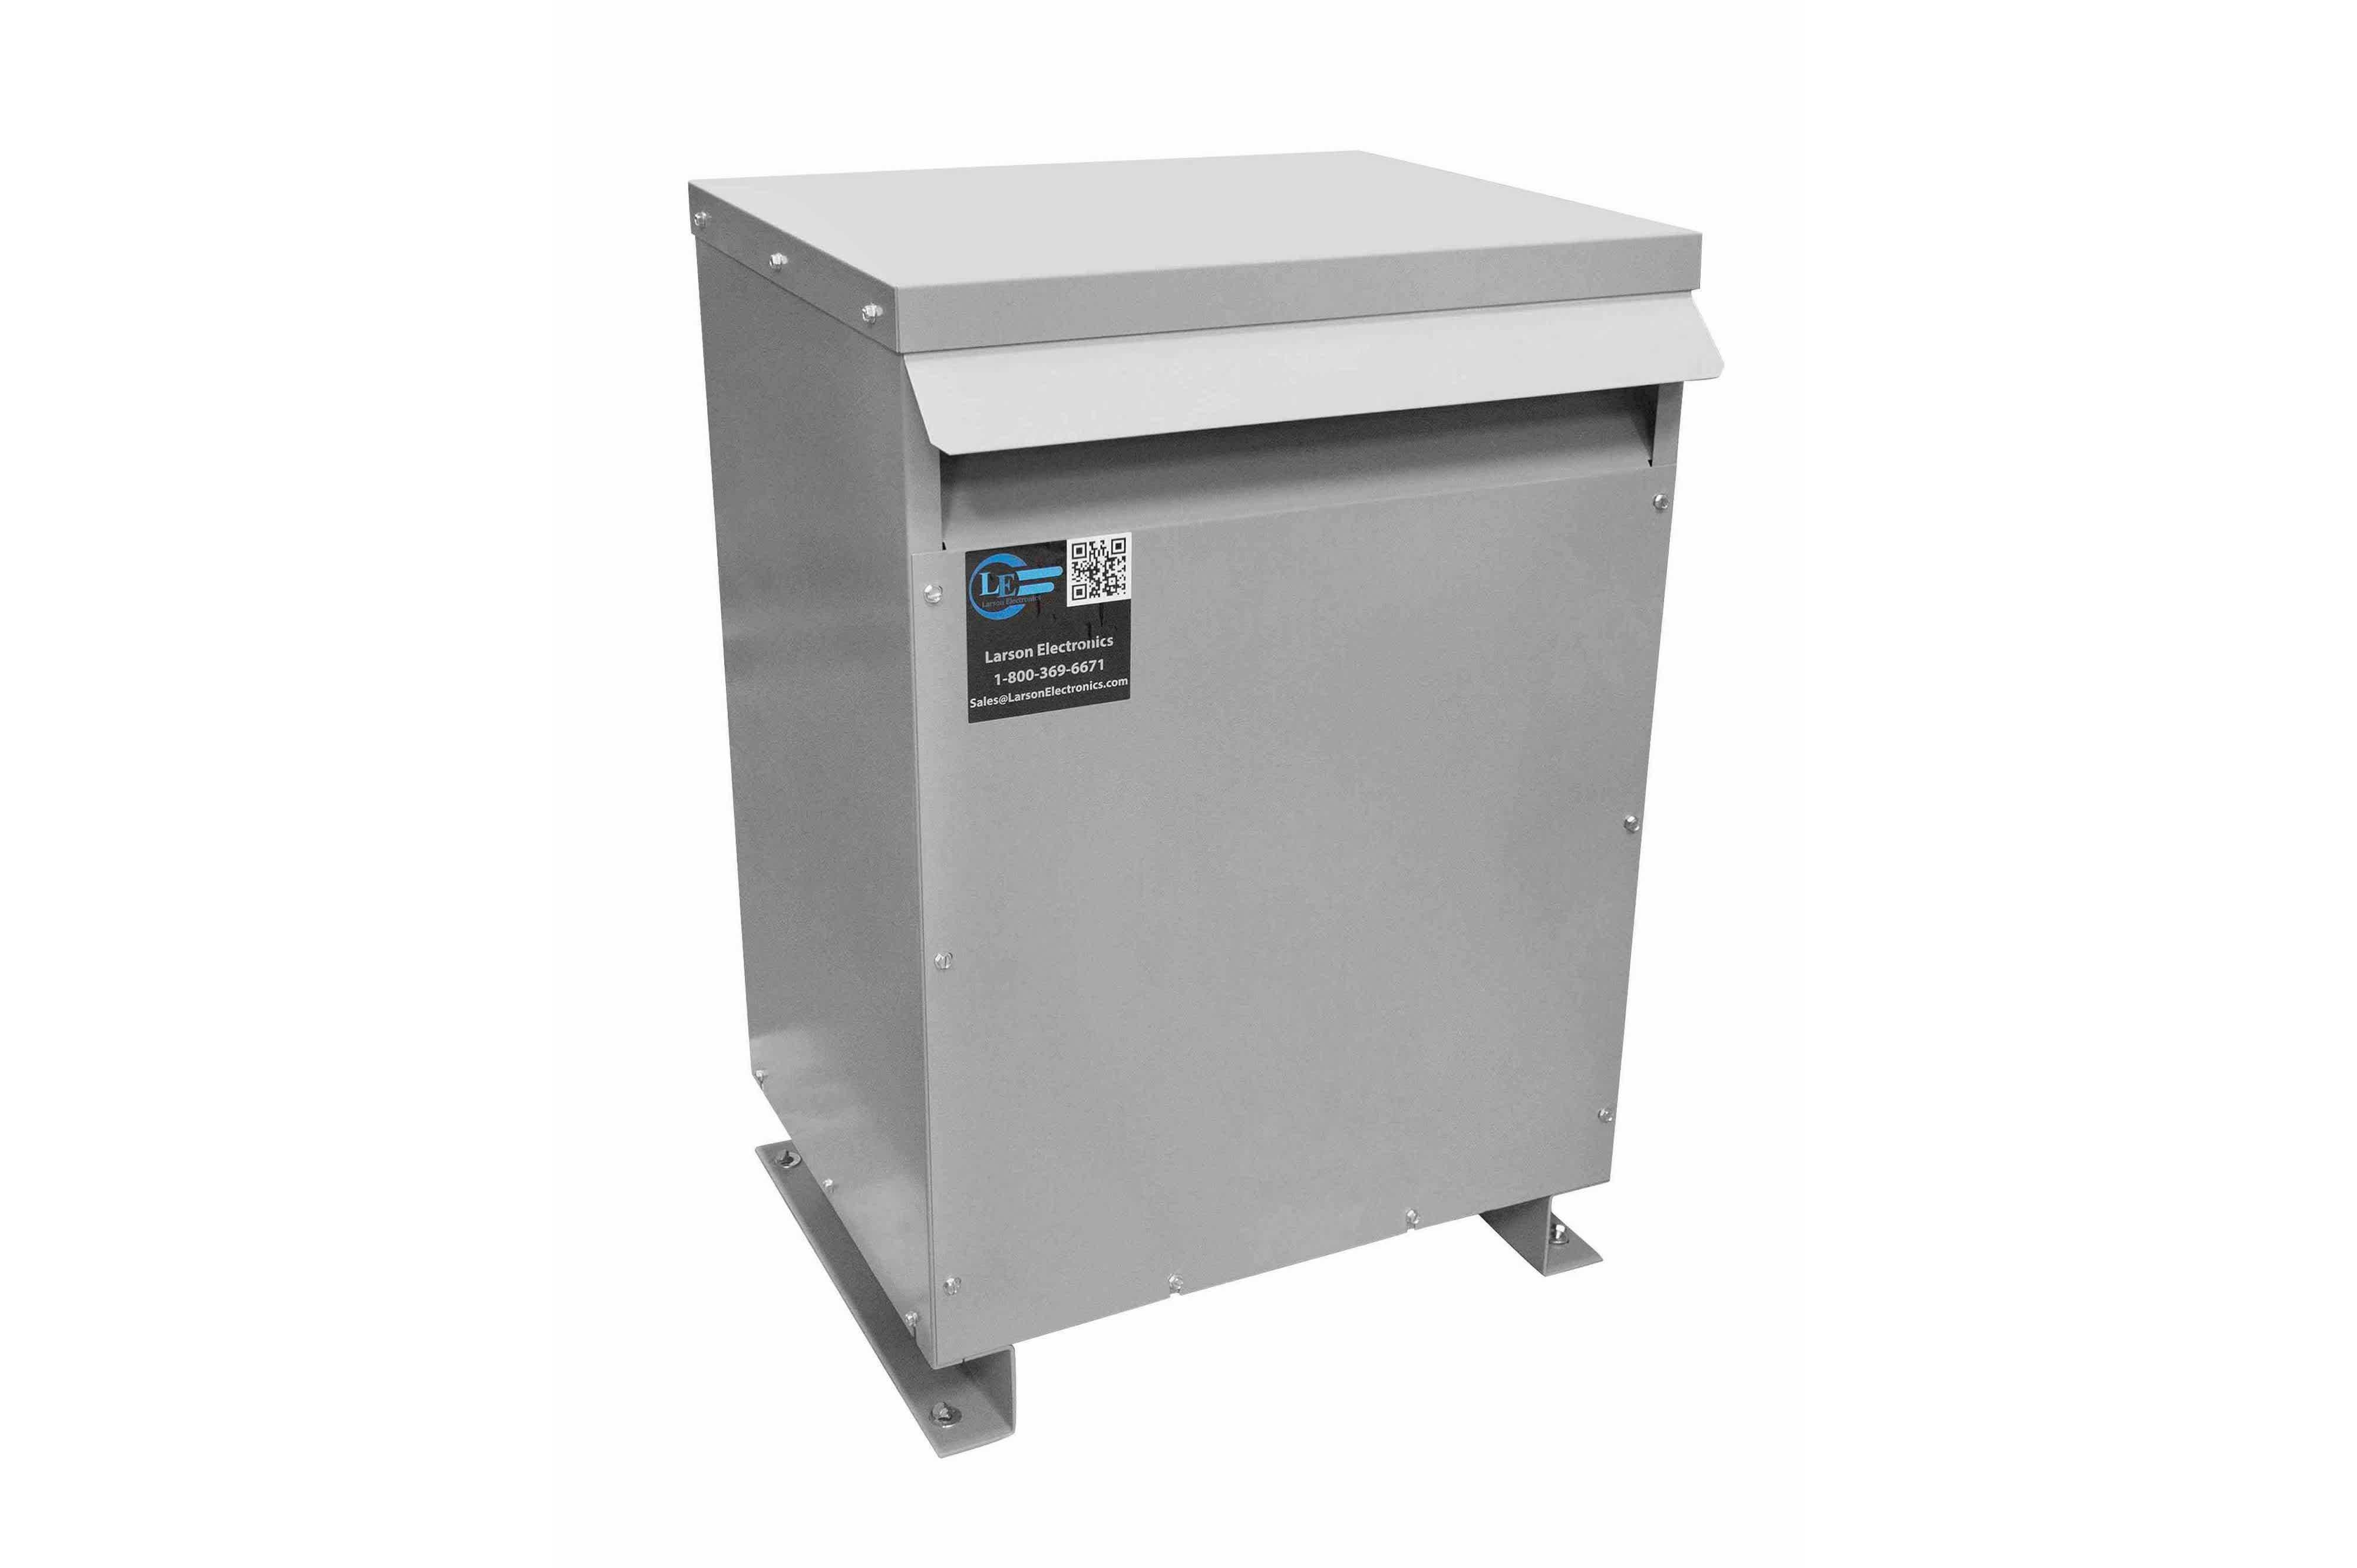 38 kVA 3PH Isolation Transformer, 440V Wye Primary, 208V Delta Secondary, N3R, Ventilated, 60 Hz